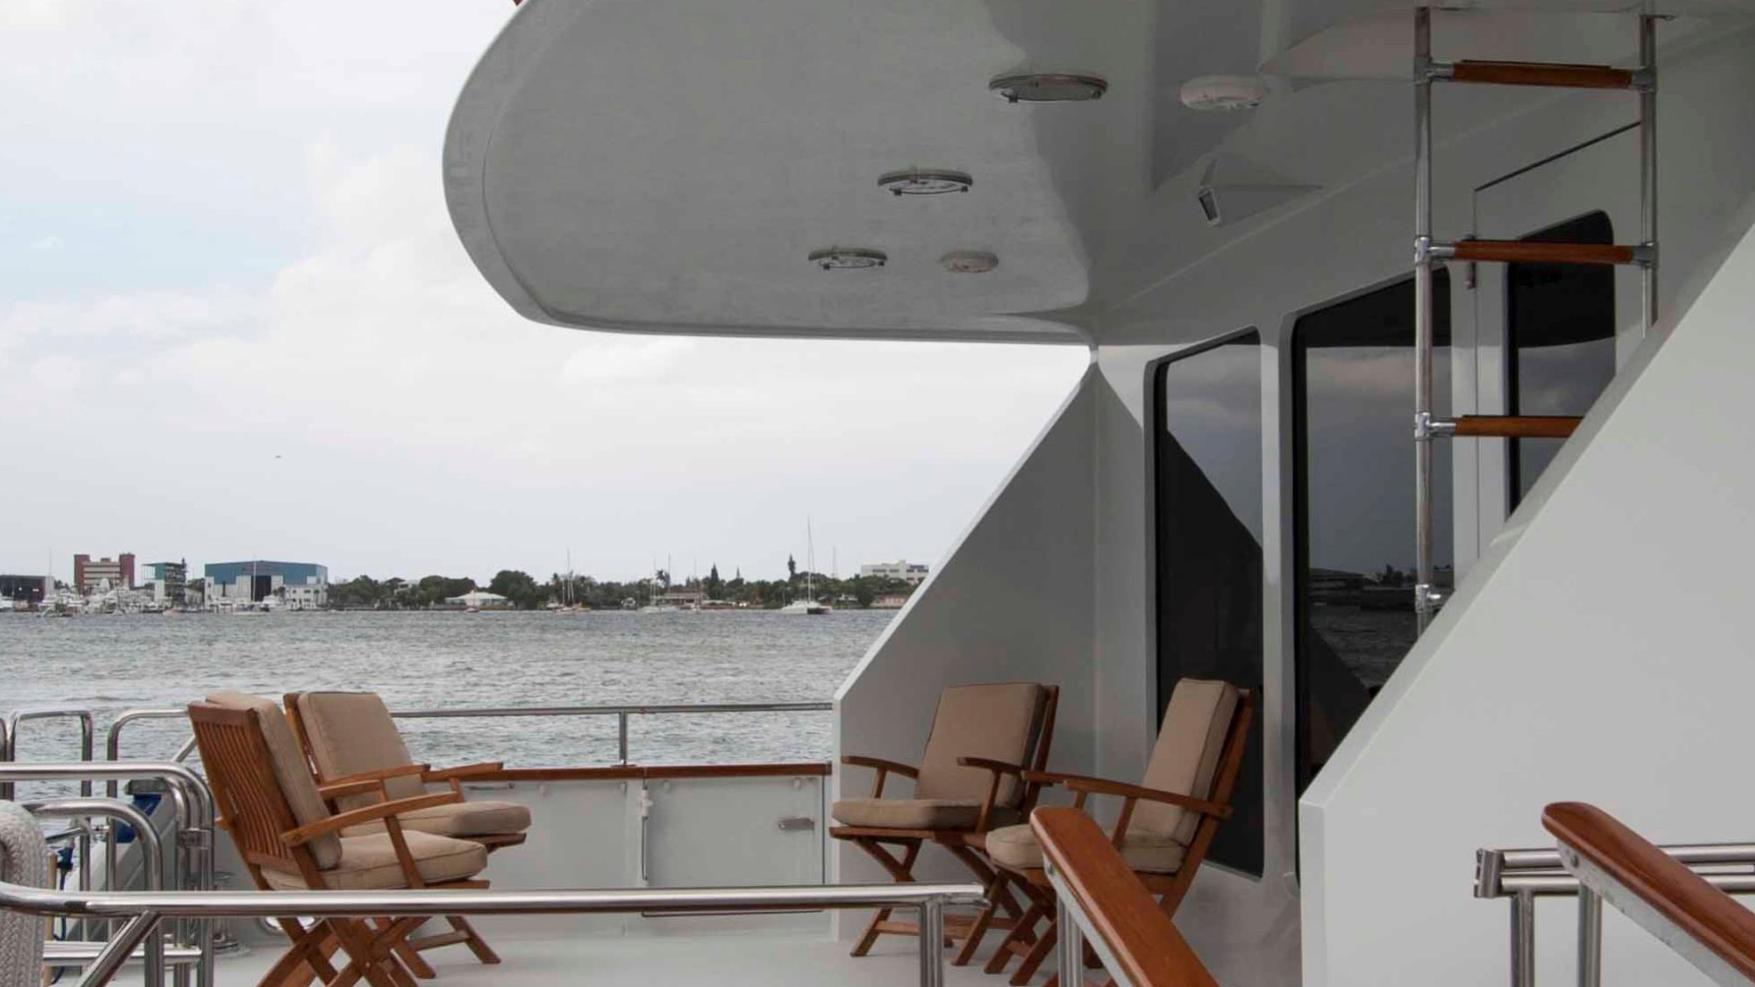 roamin-holiday-yacht-aft-deck